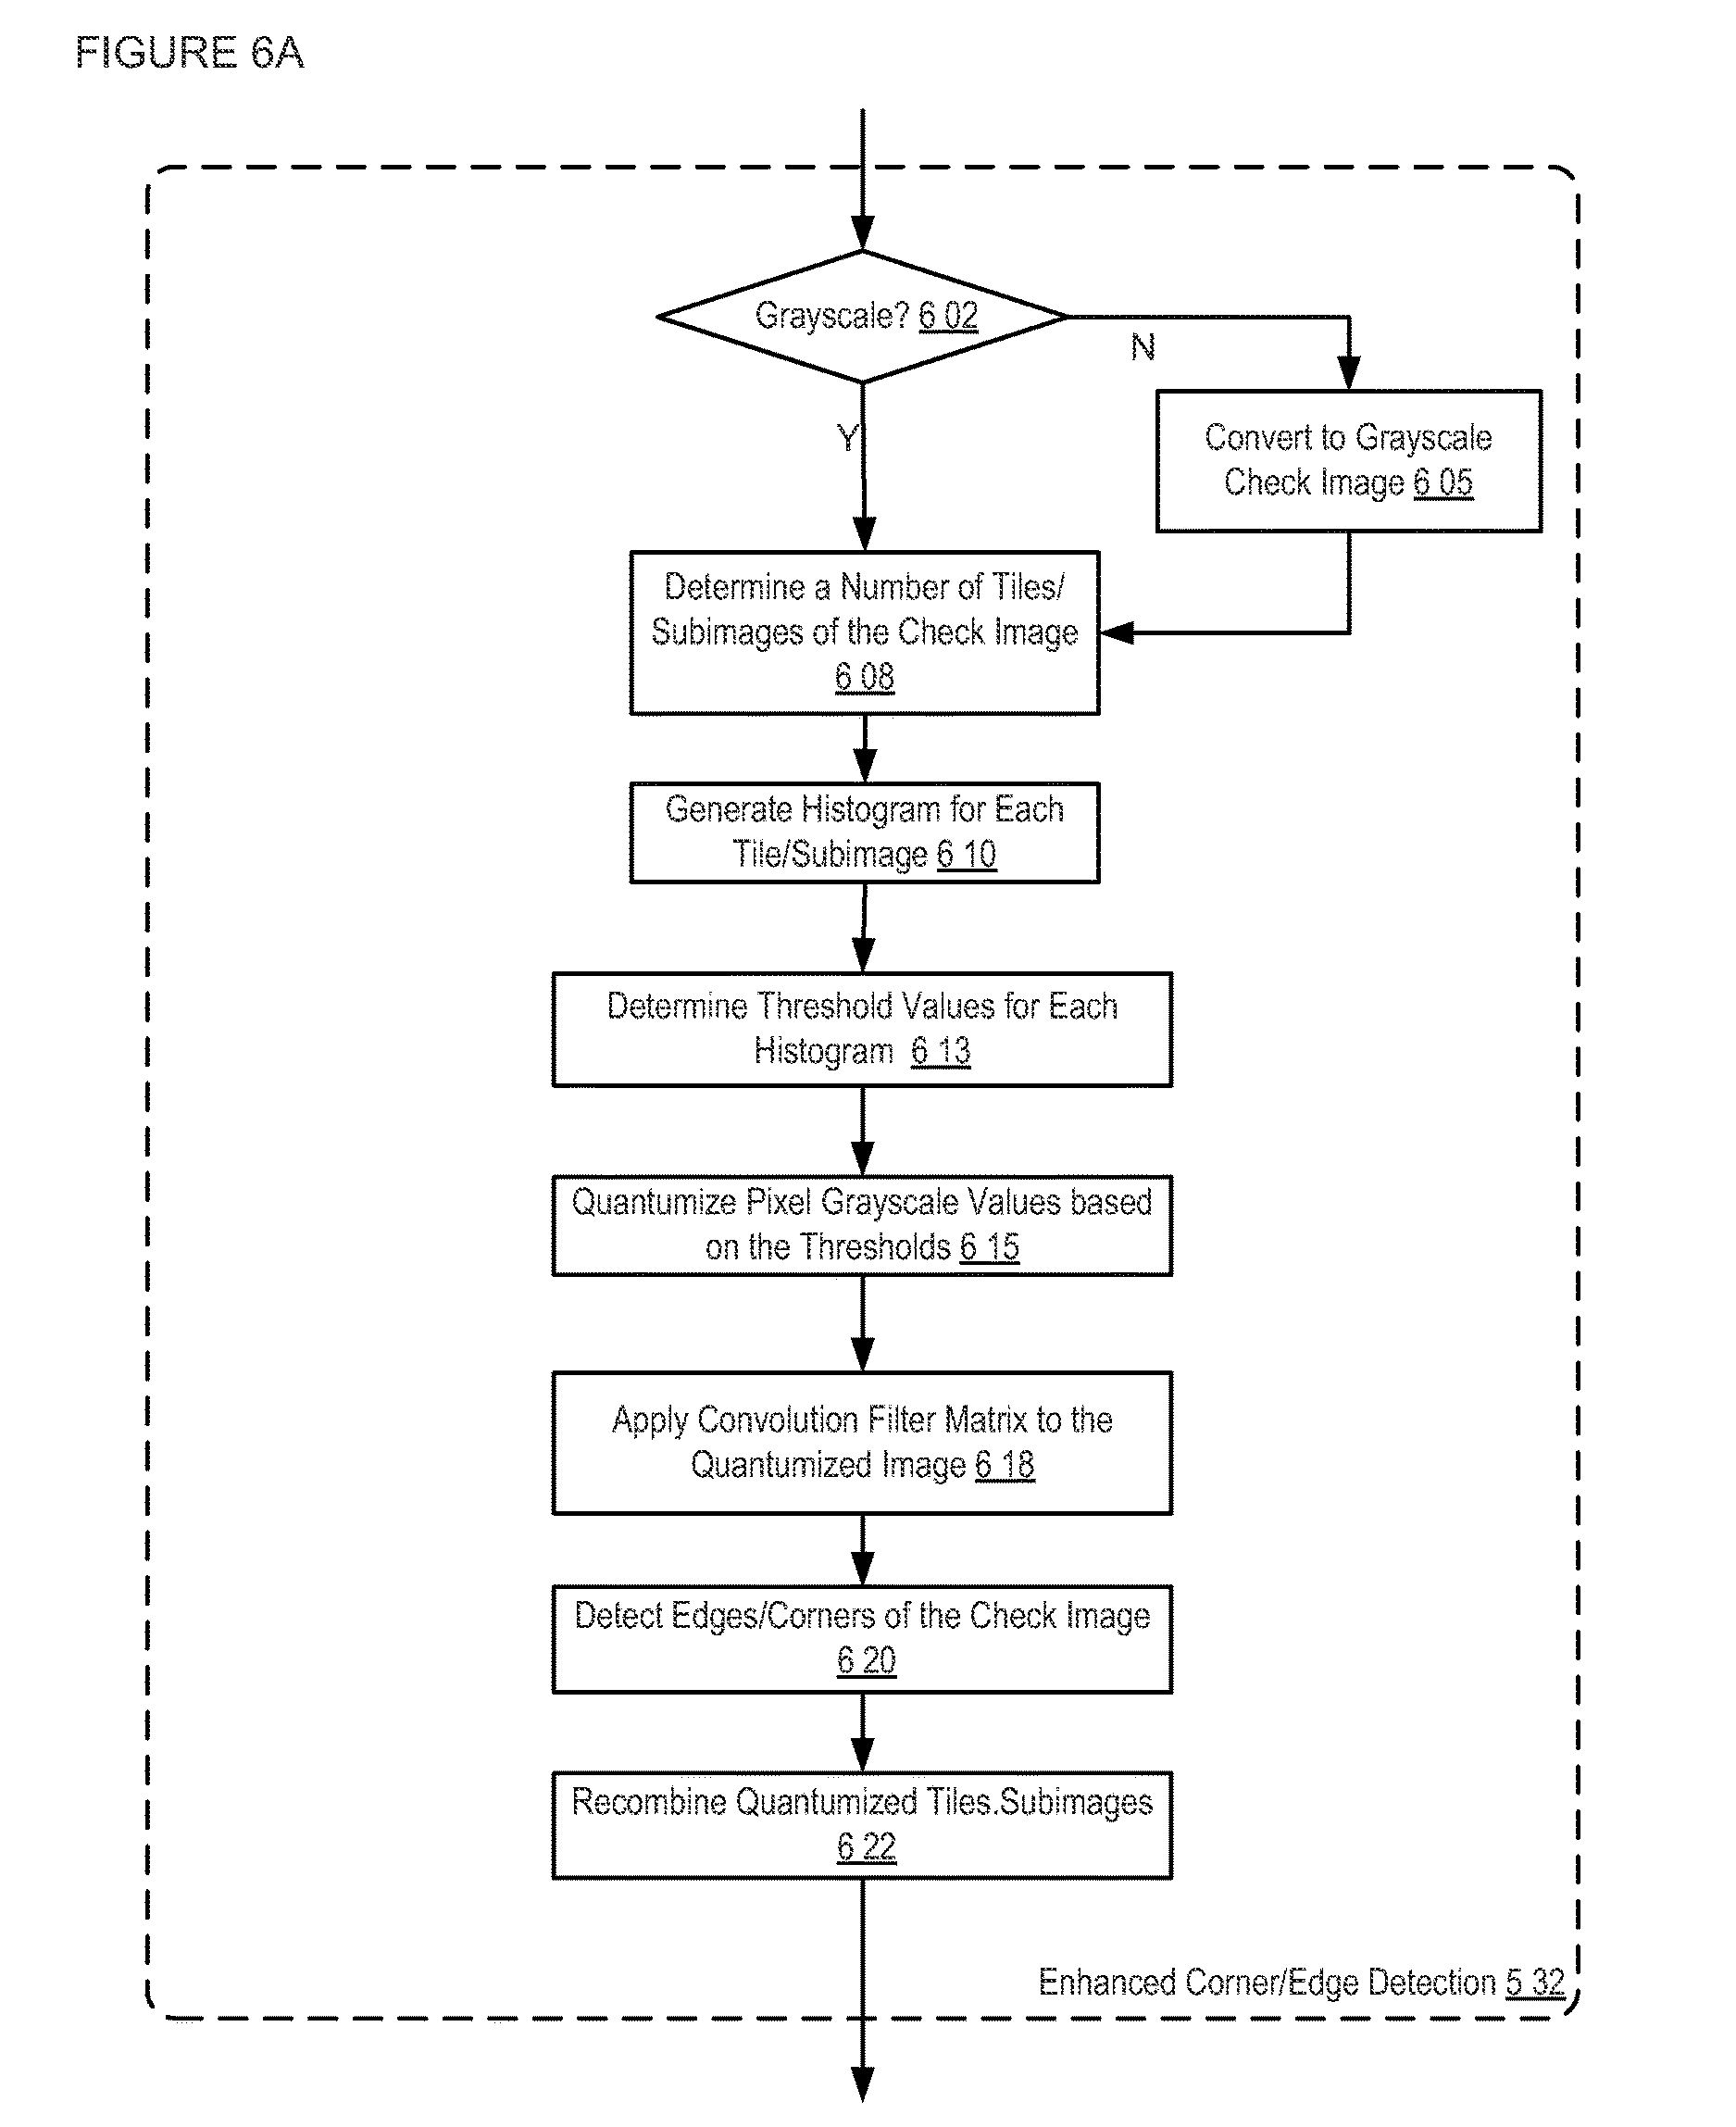 Patent US 9,779,392 B1